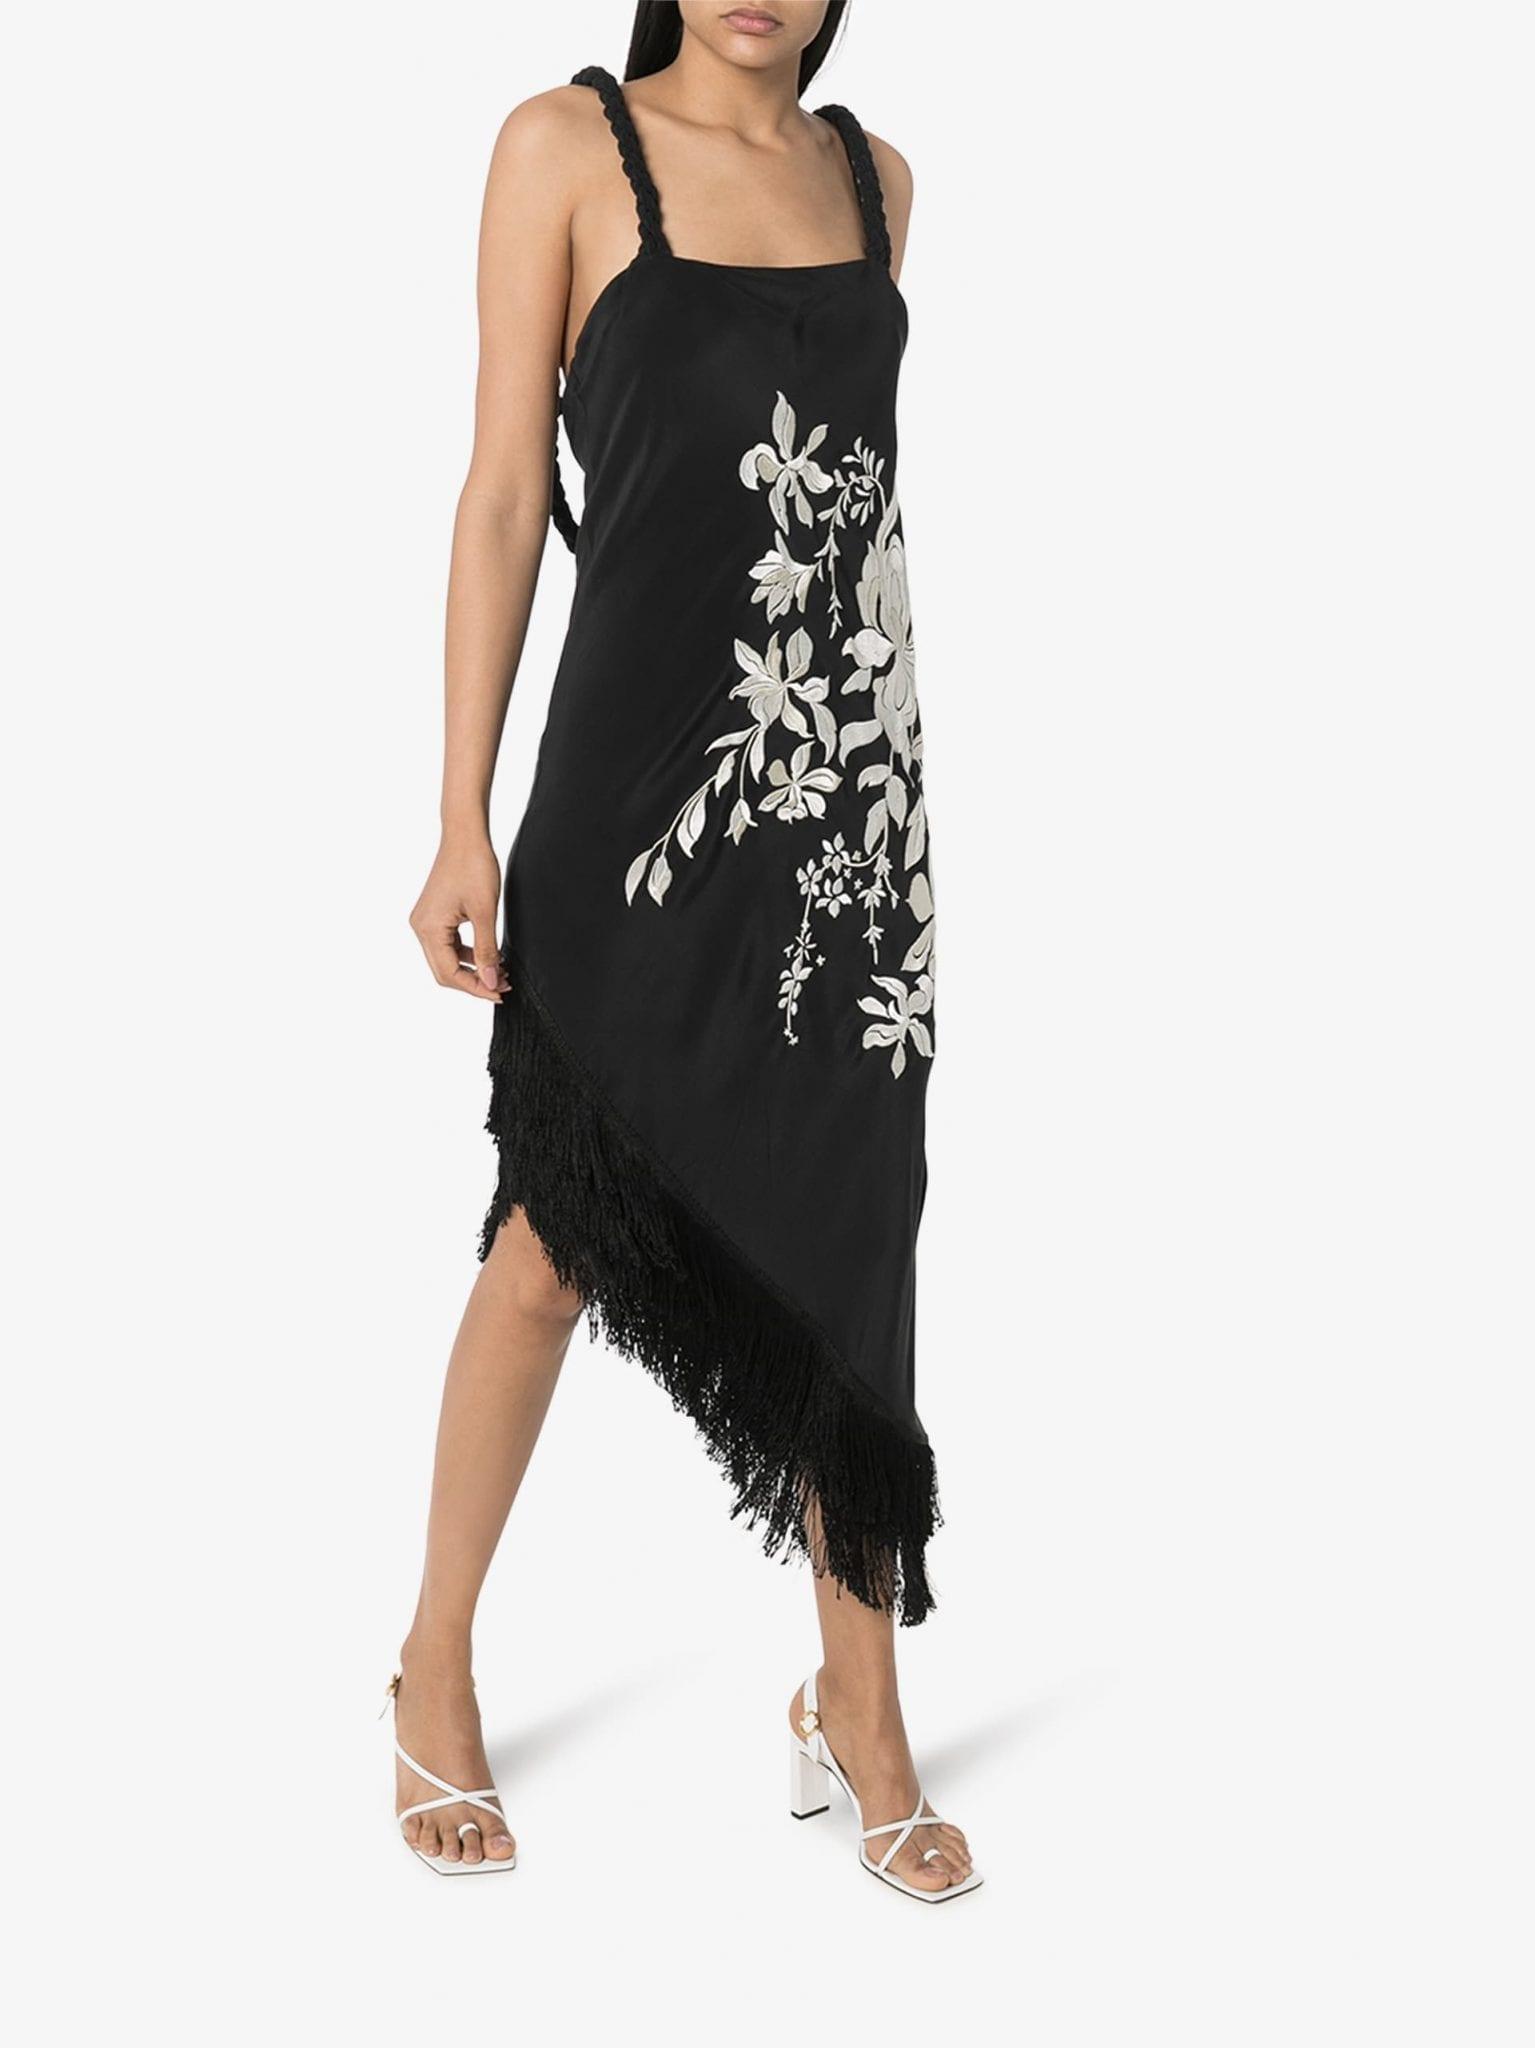 JOHANNA ORTIZ Floral And Flowers Asymmetric Midi Dress